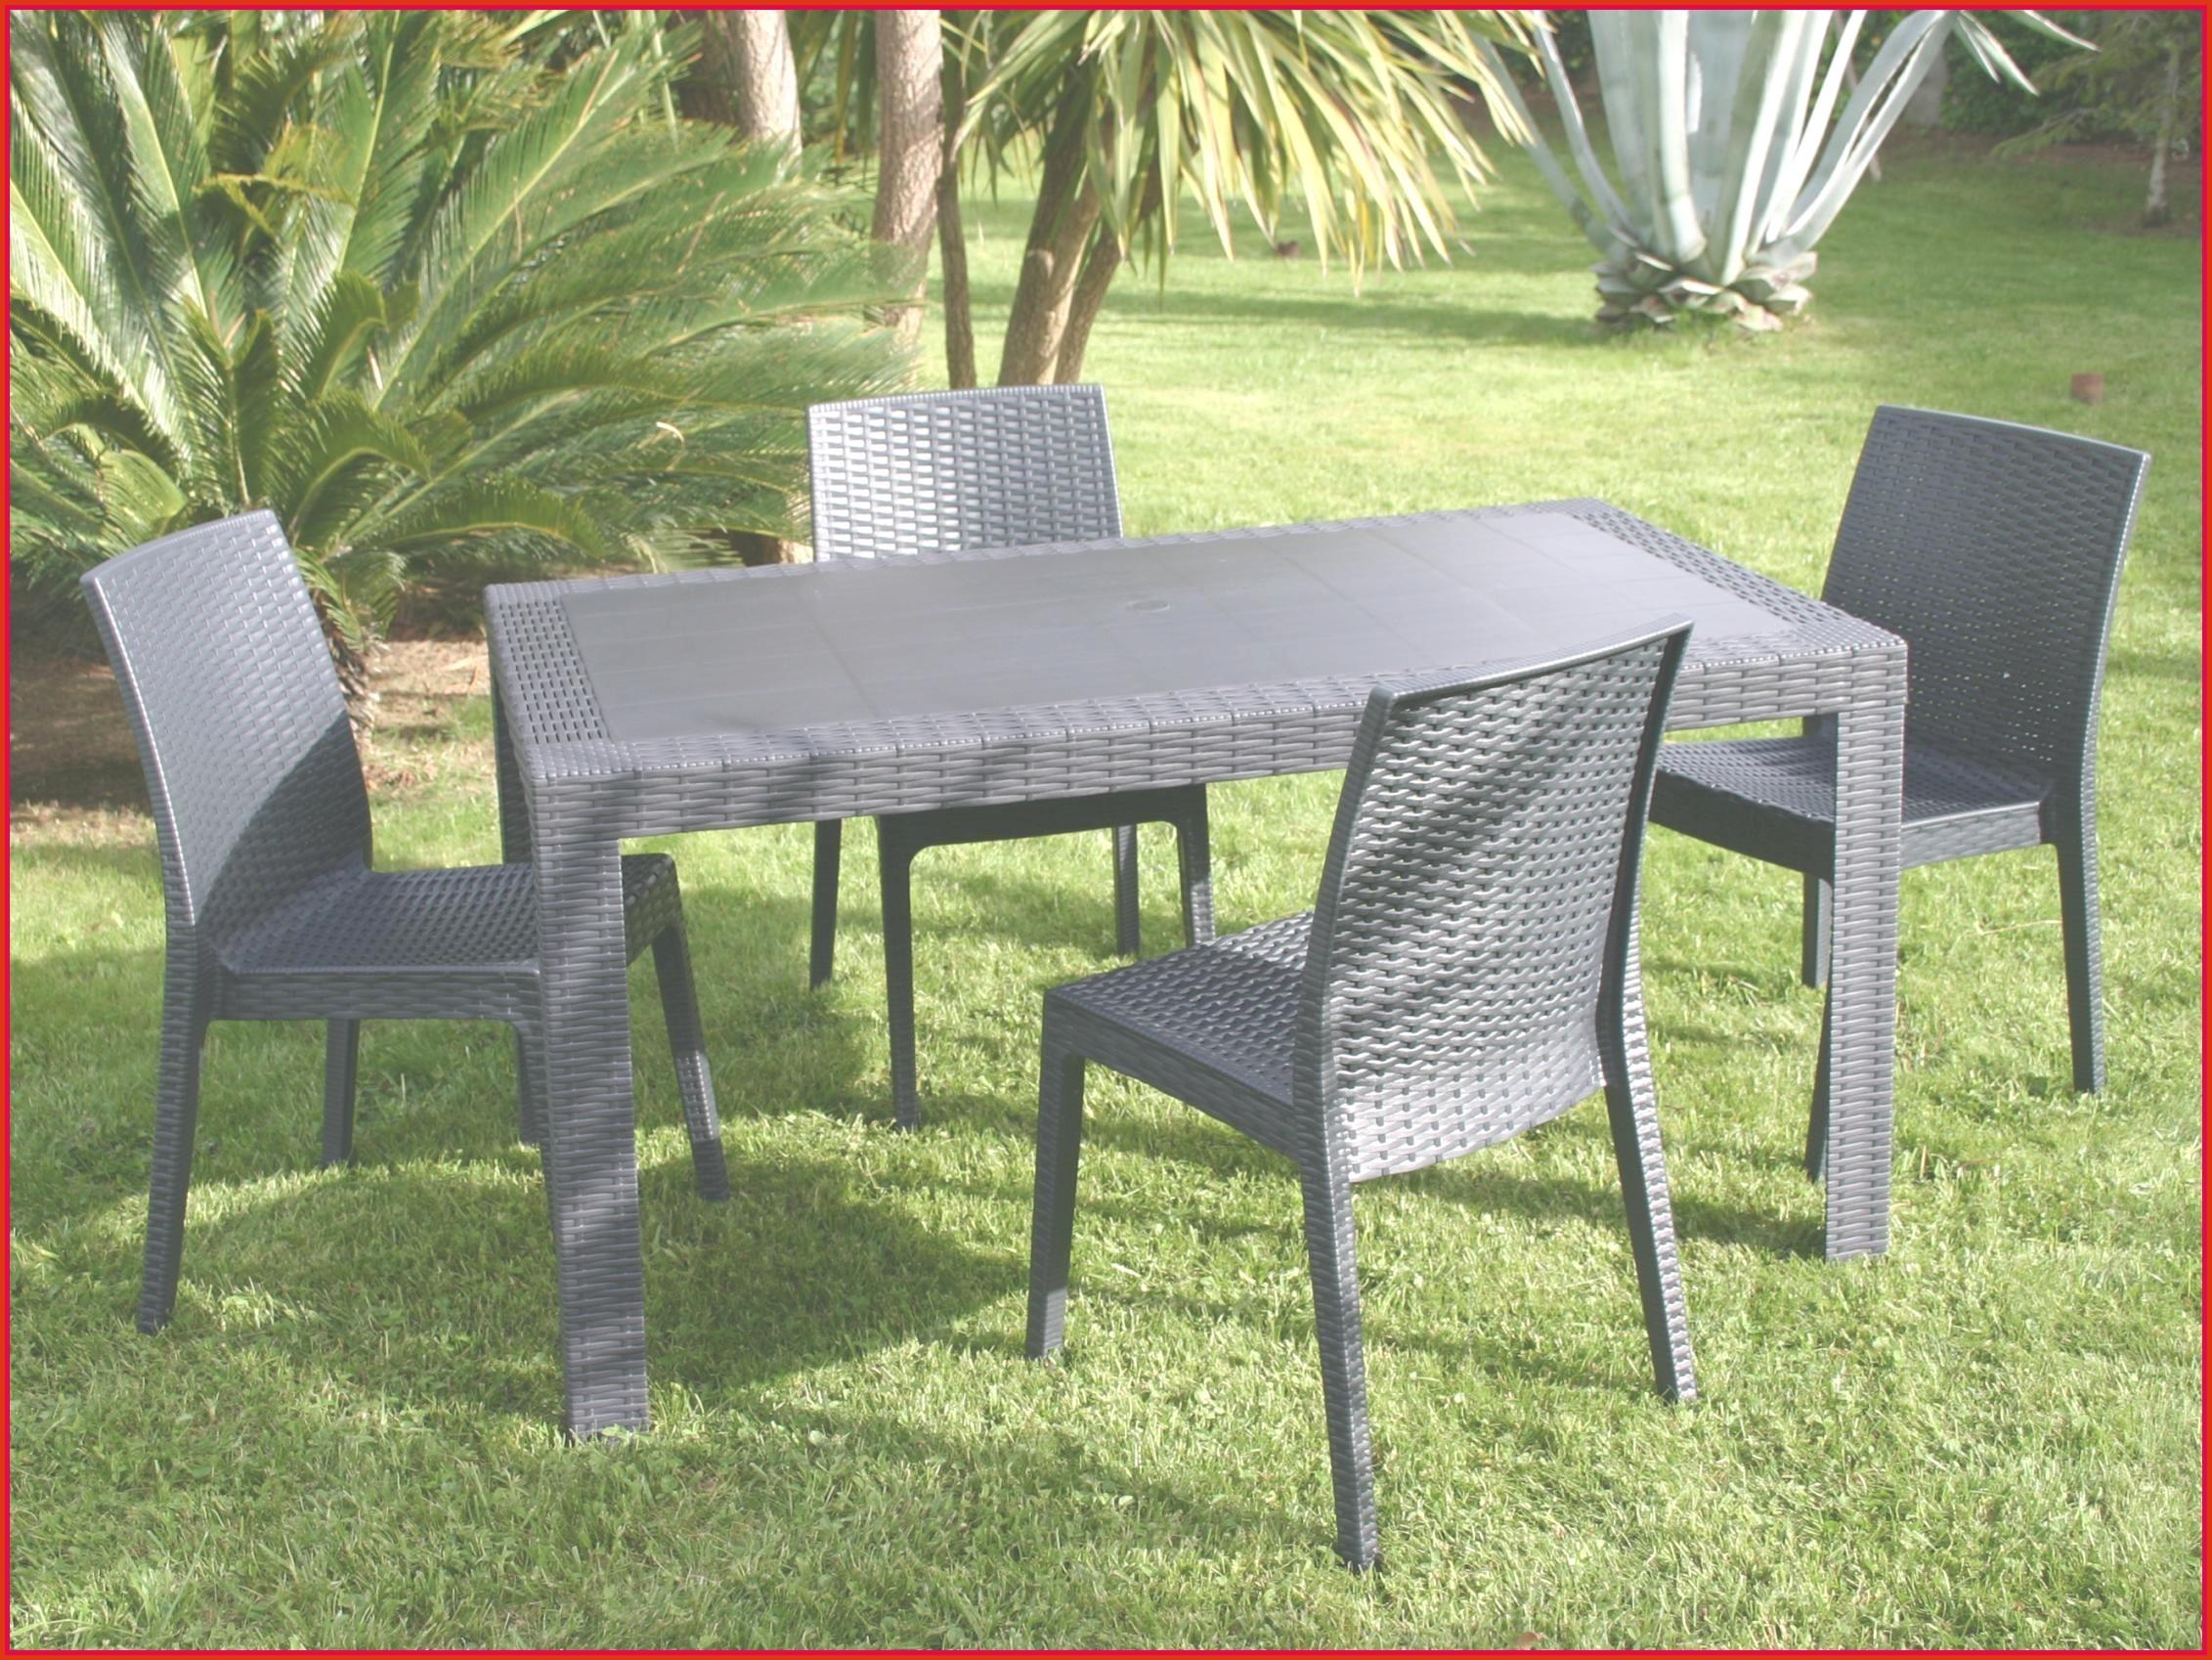 salon de jardin chez bri arche top design salon de jardin chez bri arch luxury table de jardin bri arch